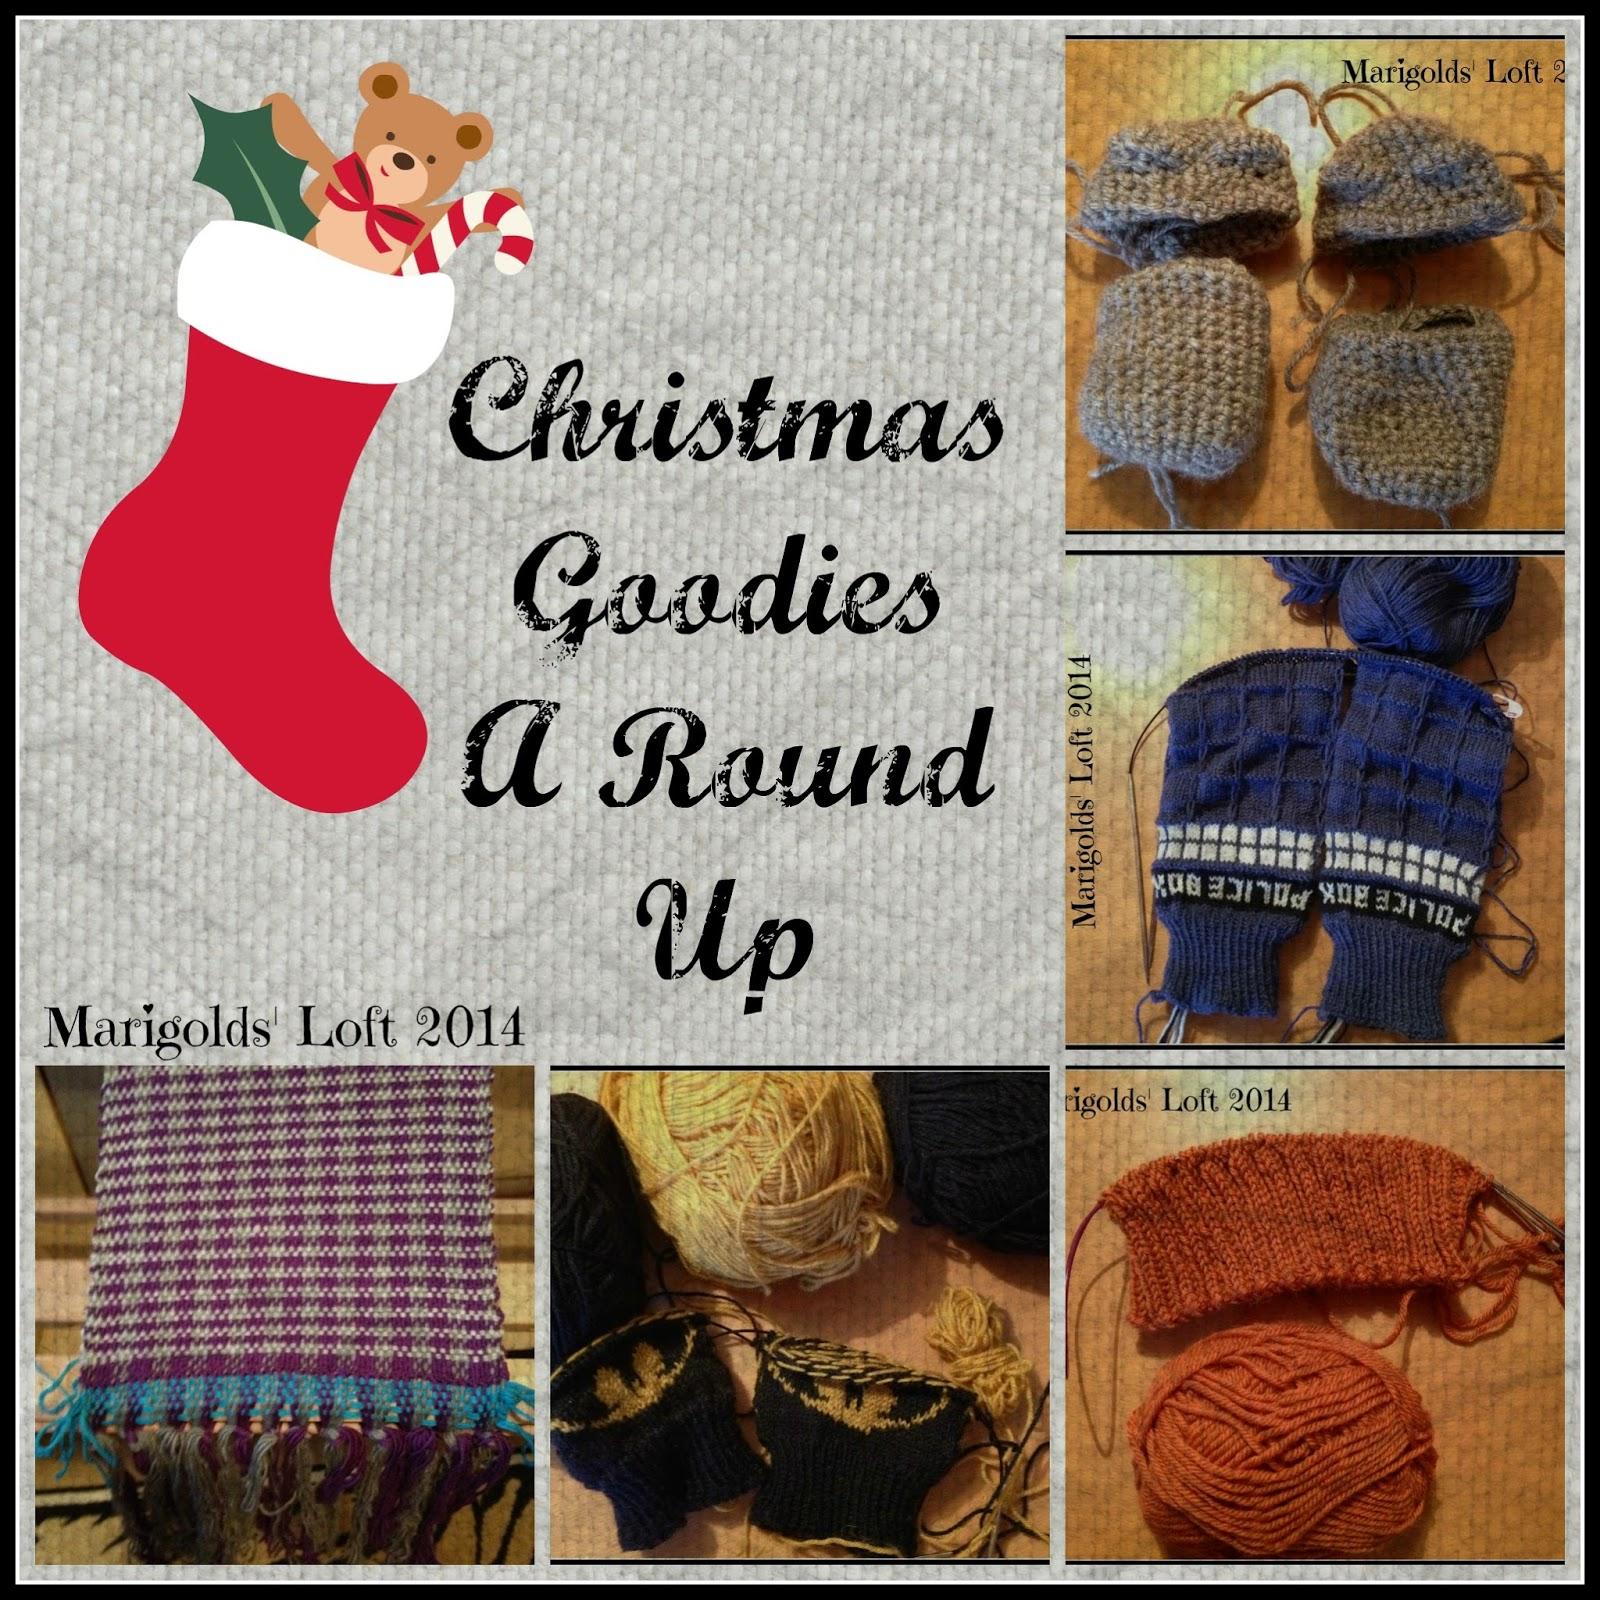 A Round Up of Handmade Christmas Goodies